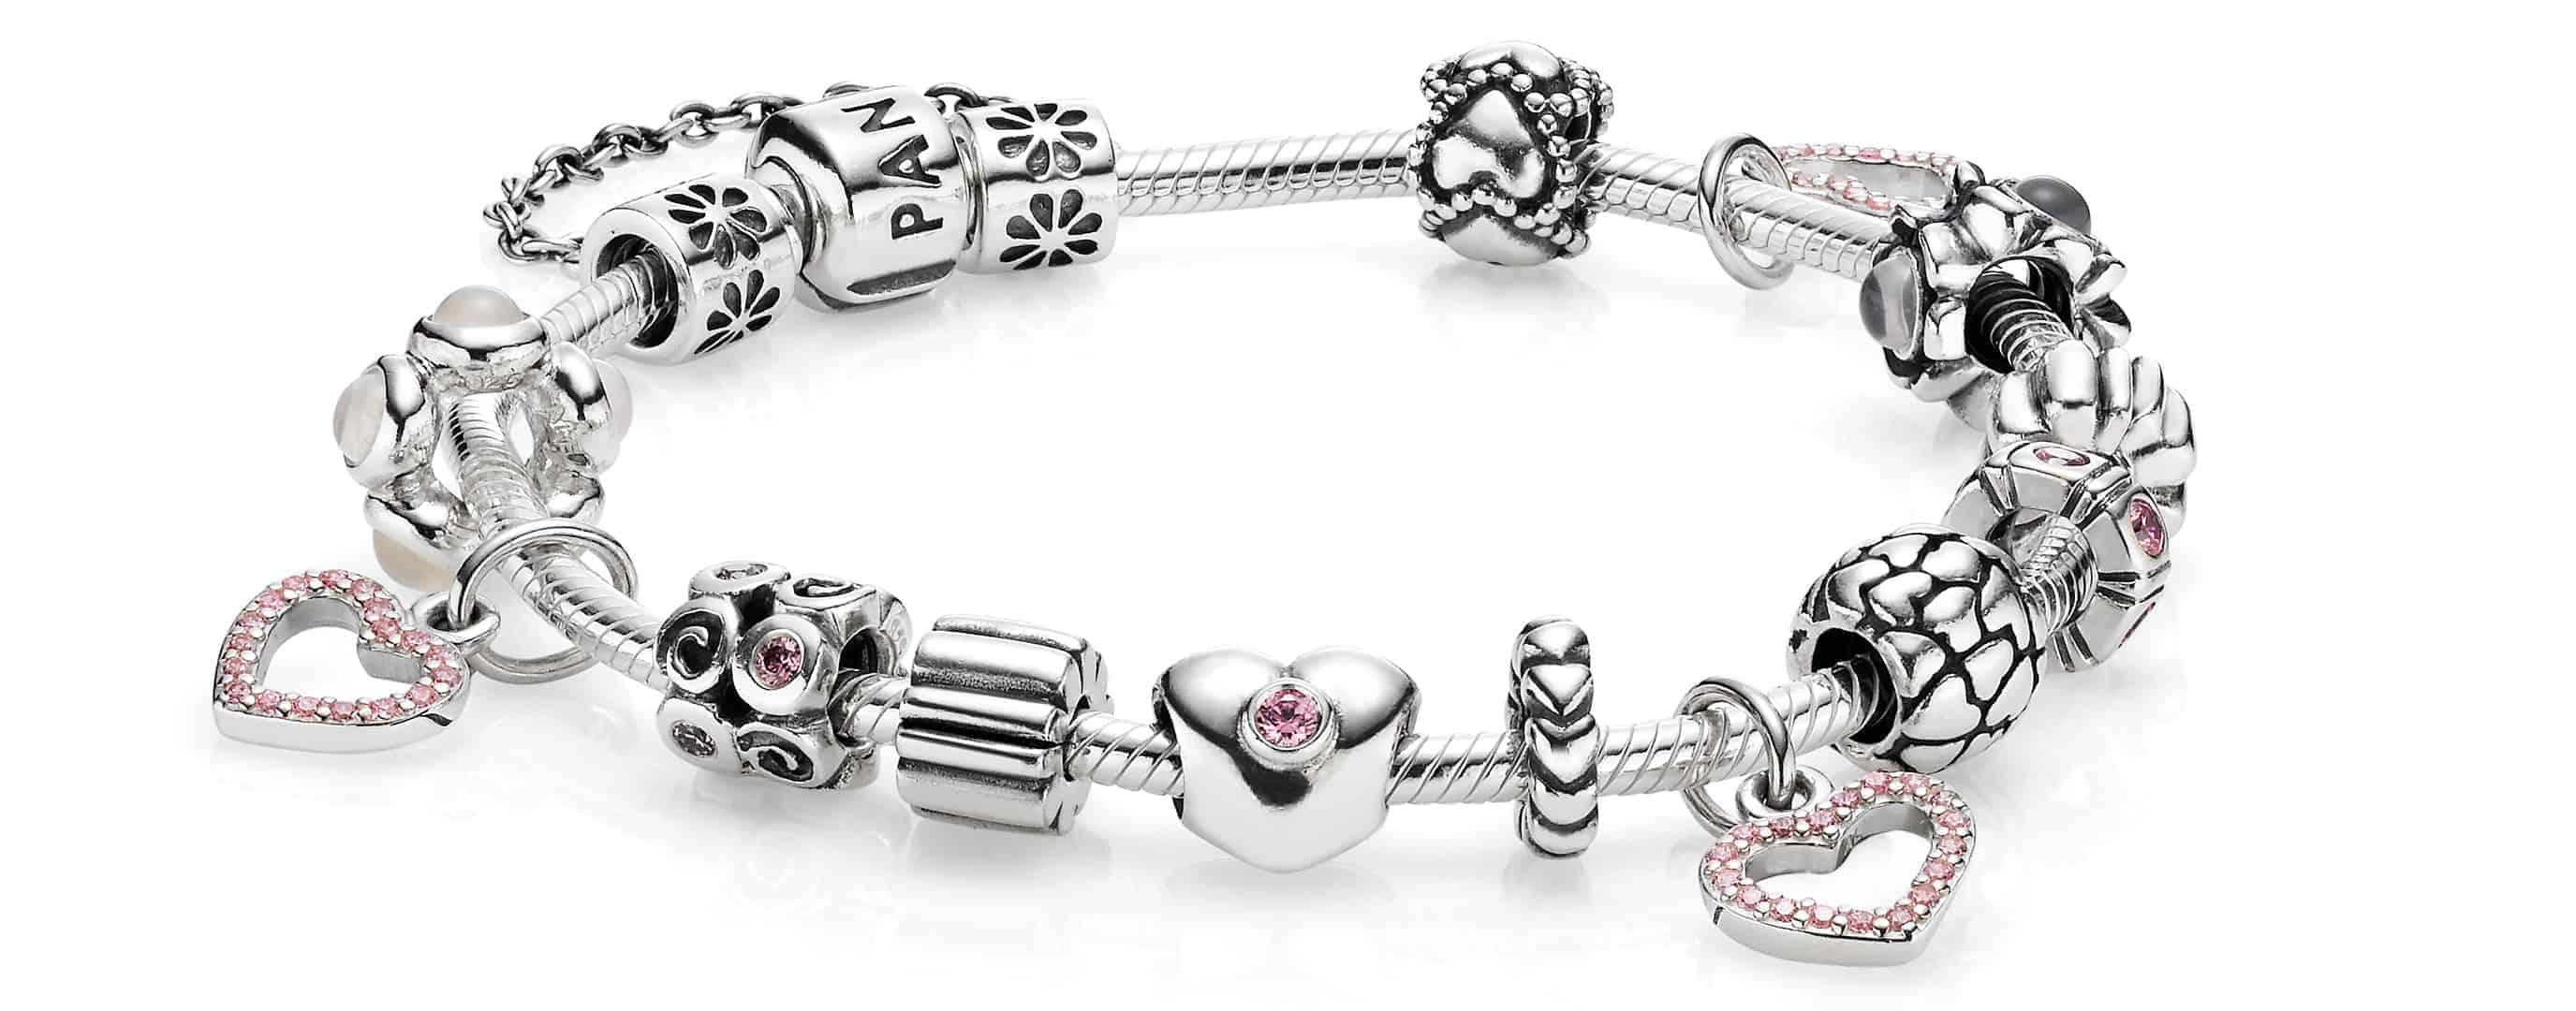 Pandora Bracelet Design Ideas i want pandora design your own photo charms Pandora Bangle Charm Bracelet Bracelets Bangles Design Ideas